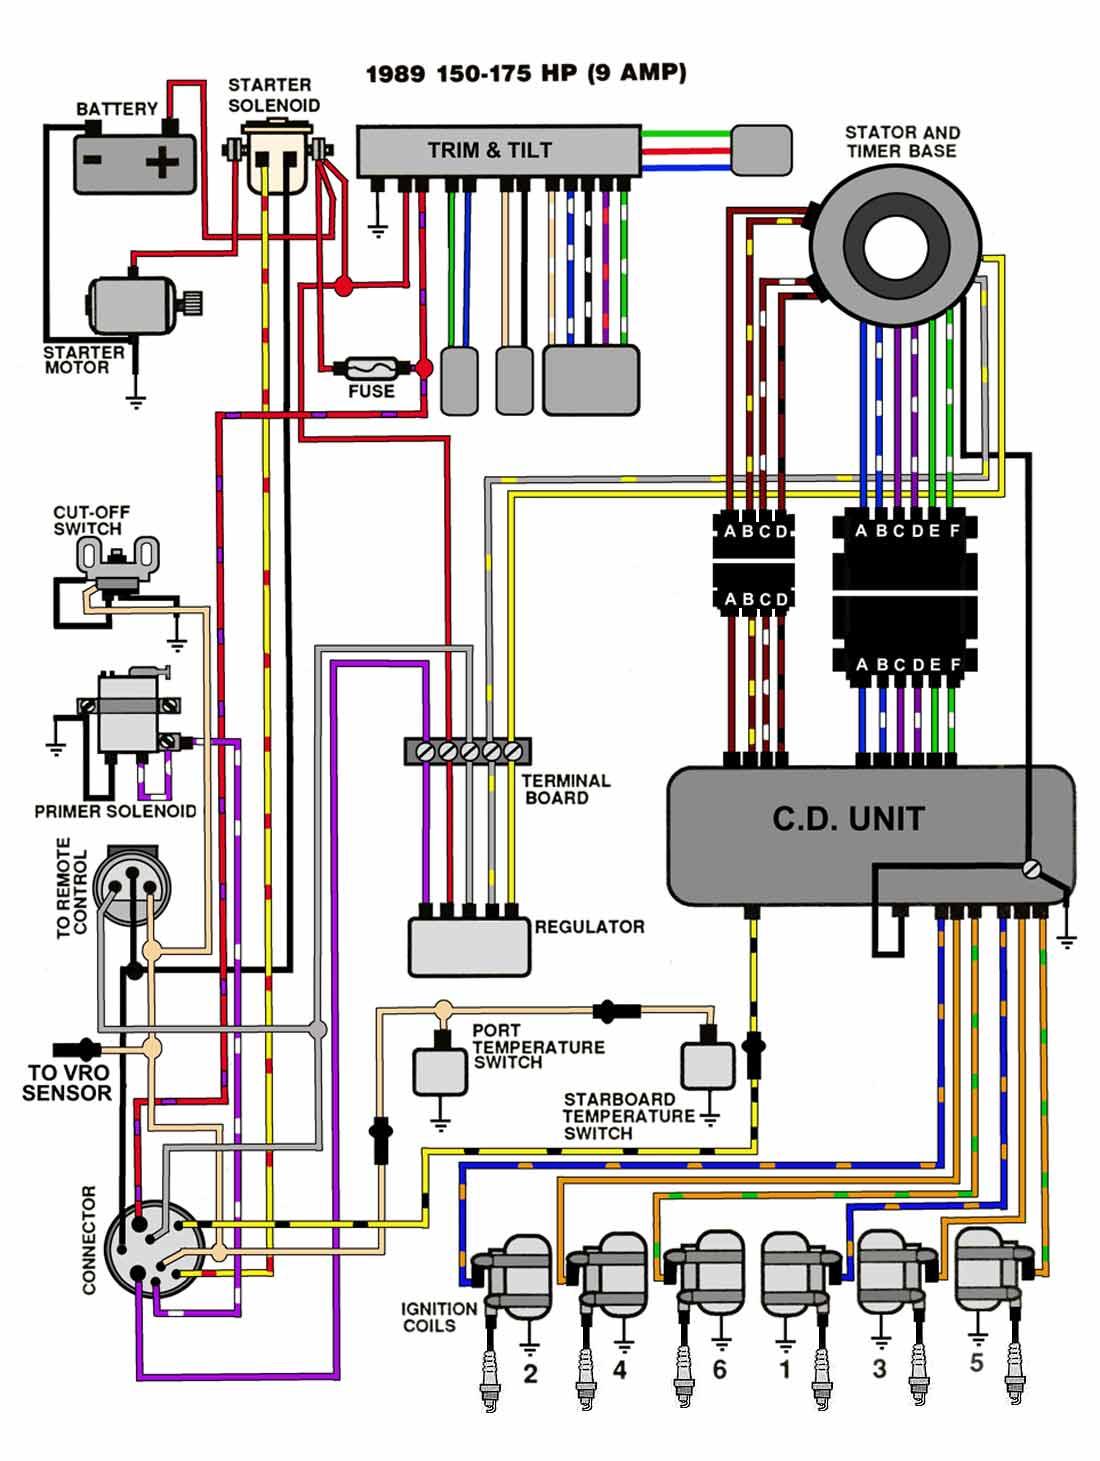 Surprising Evinrude 15 Hp Electric Start Wiring Diagram Wiring Diagram Wiring Cloud Hemtshollocom